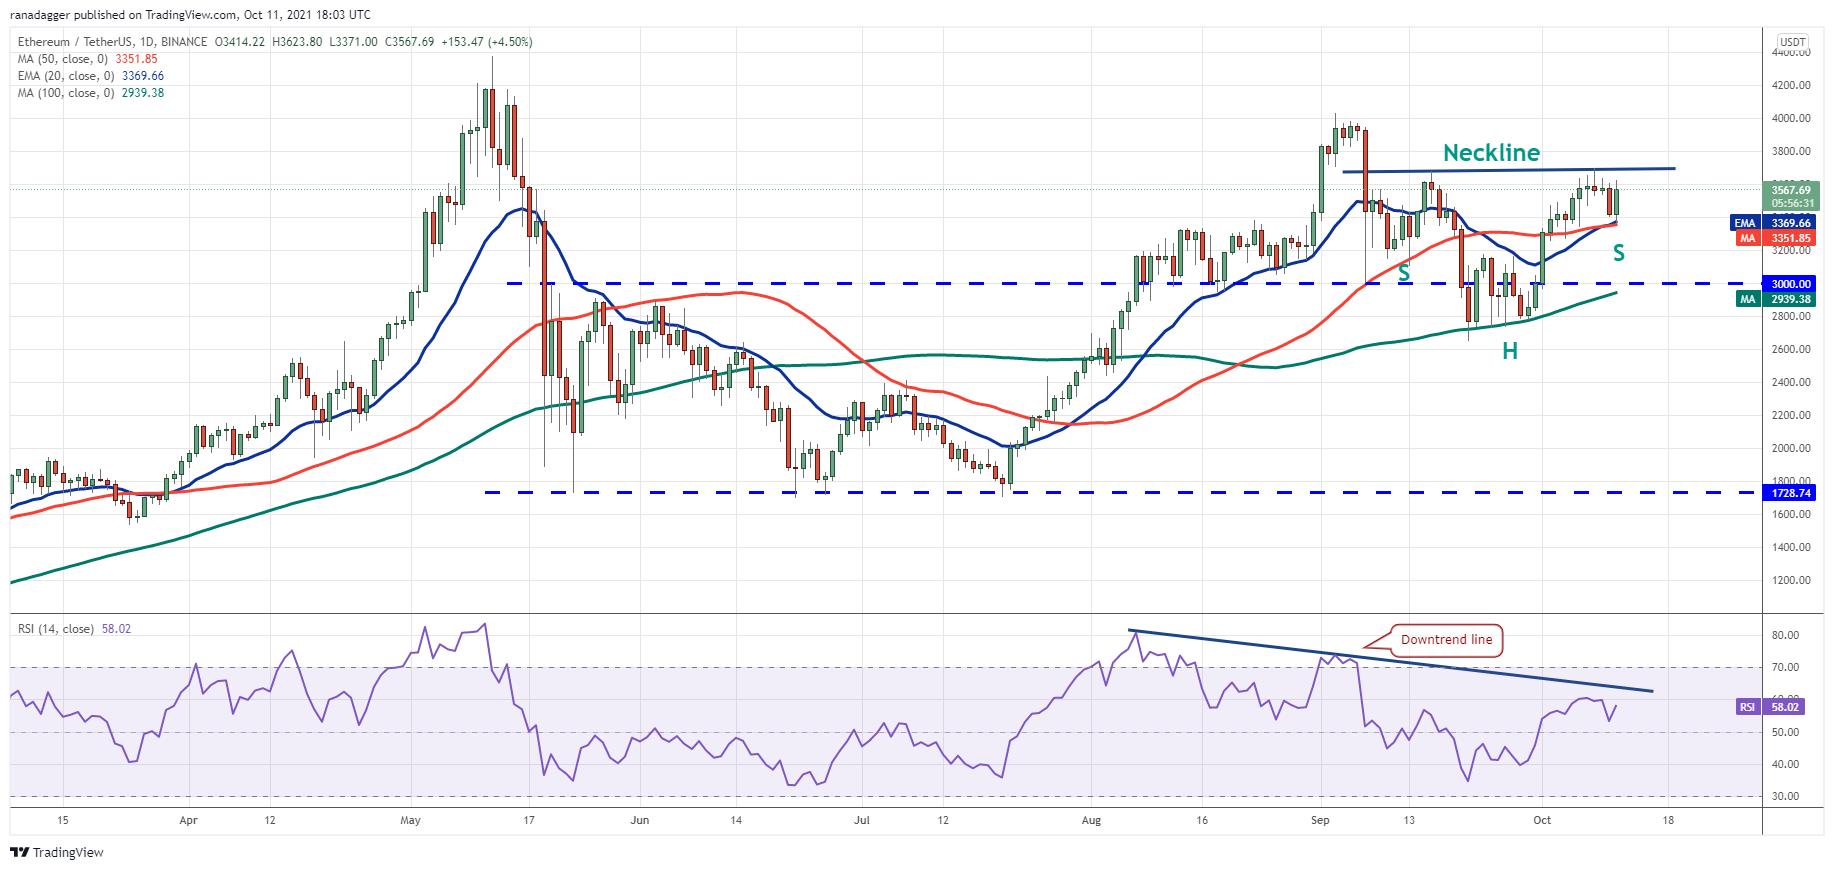 Price analysis 10/11: BTC, ETH, BNB, ADA, XRP, SOL, DOGE, DOT, LUNA, UNI3